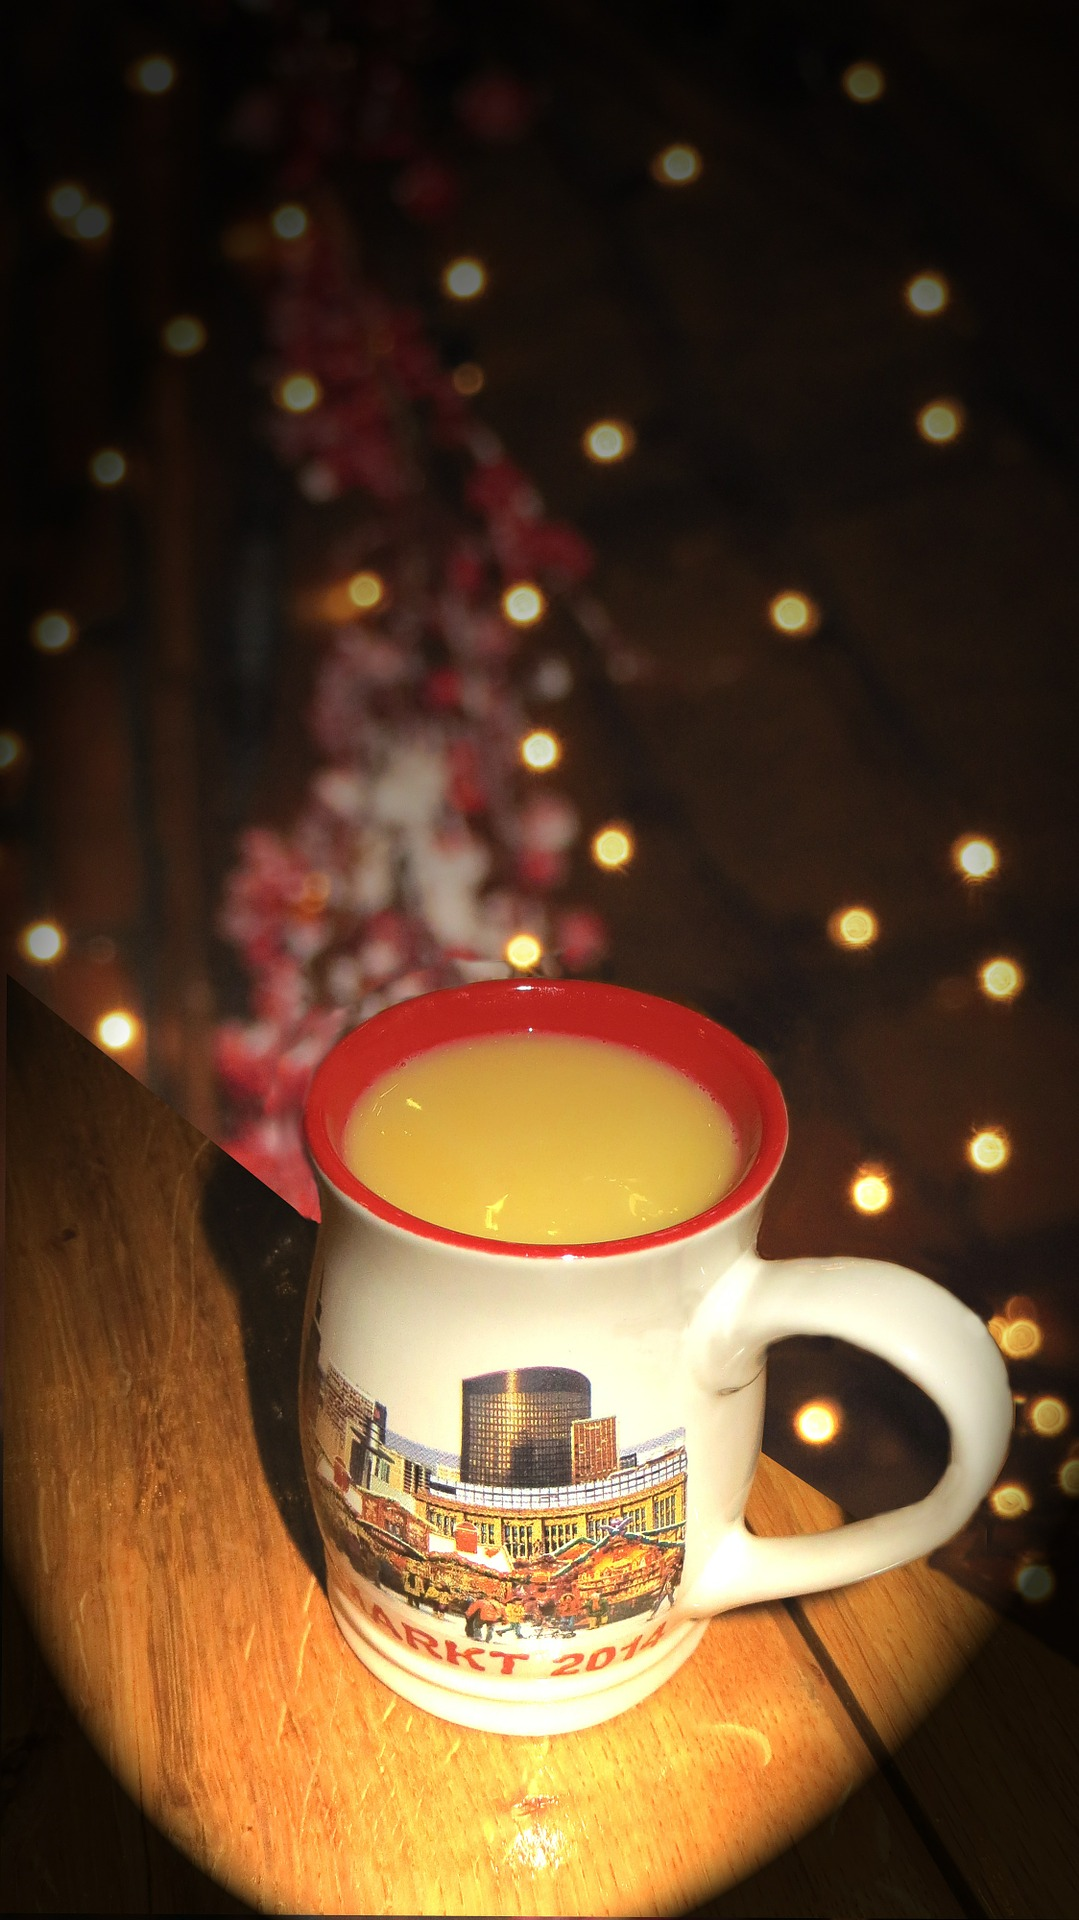 El Eggnog, un clásico navideño